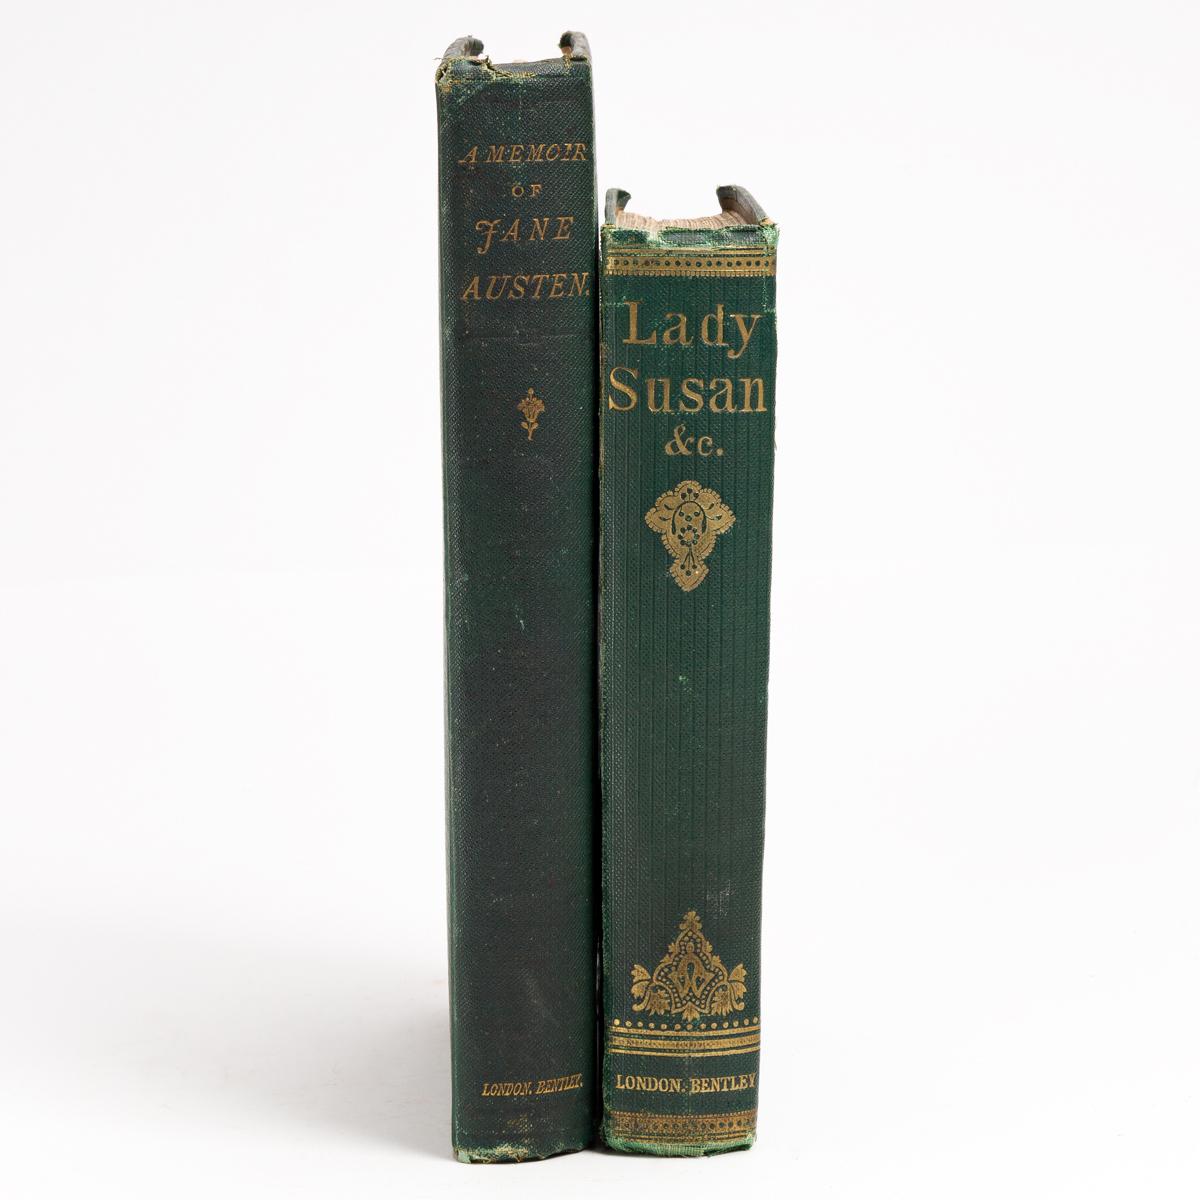 AUSTEN-LEIGH, J.E. A Memoir of Jane Austen by her Nephew.